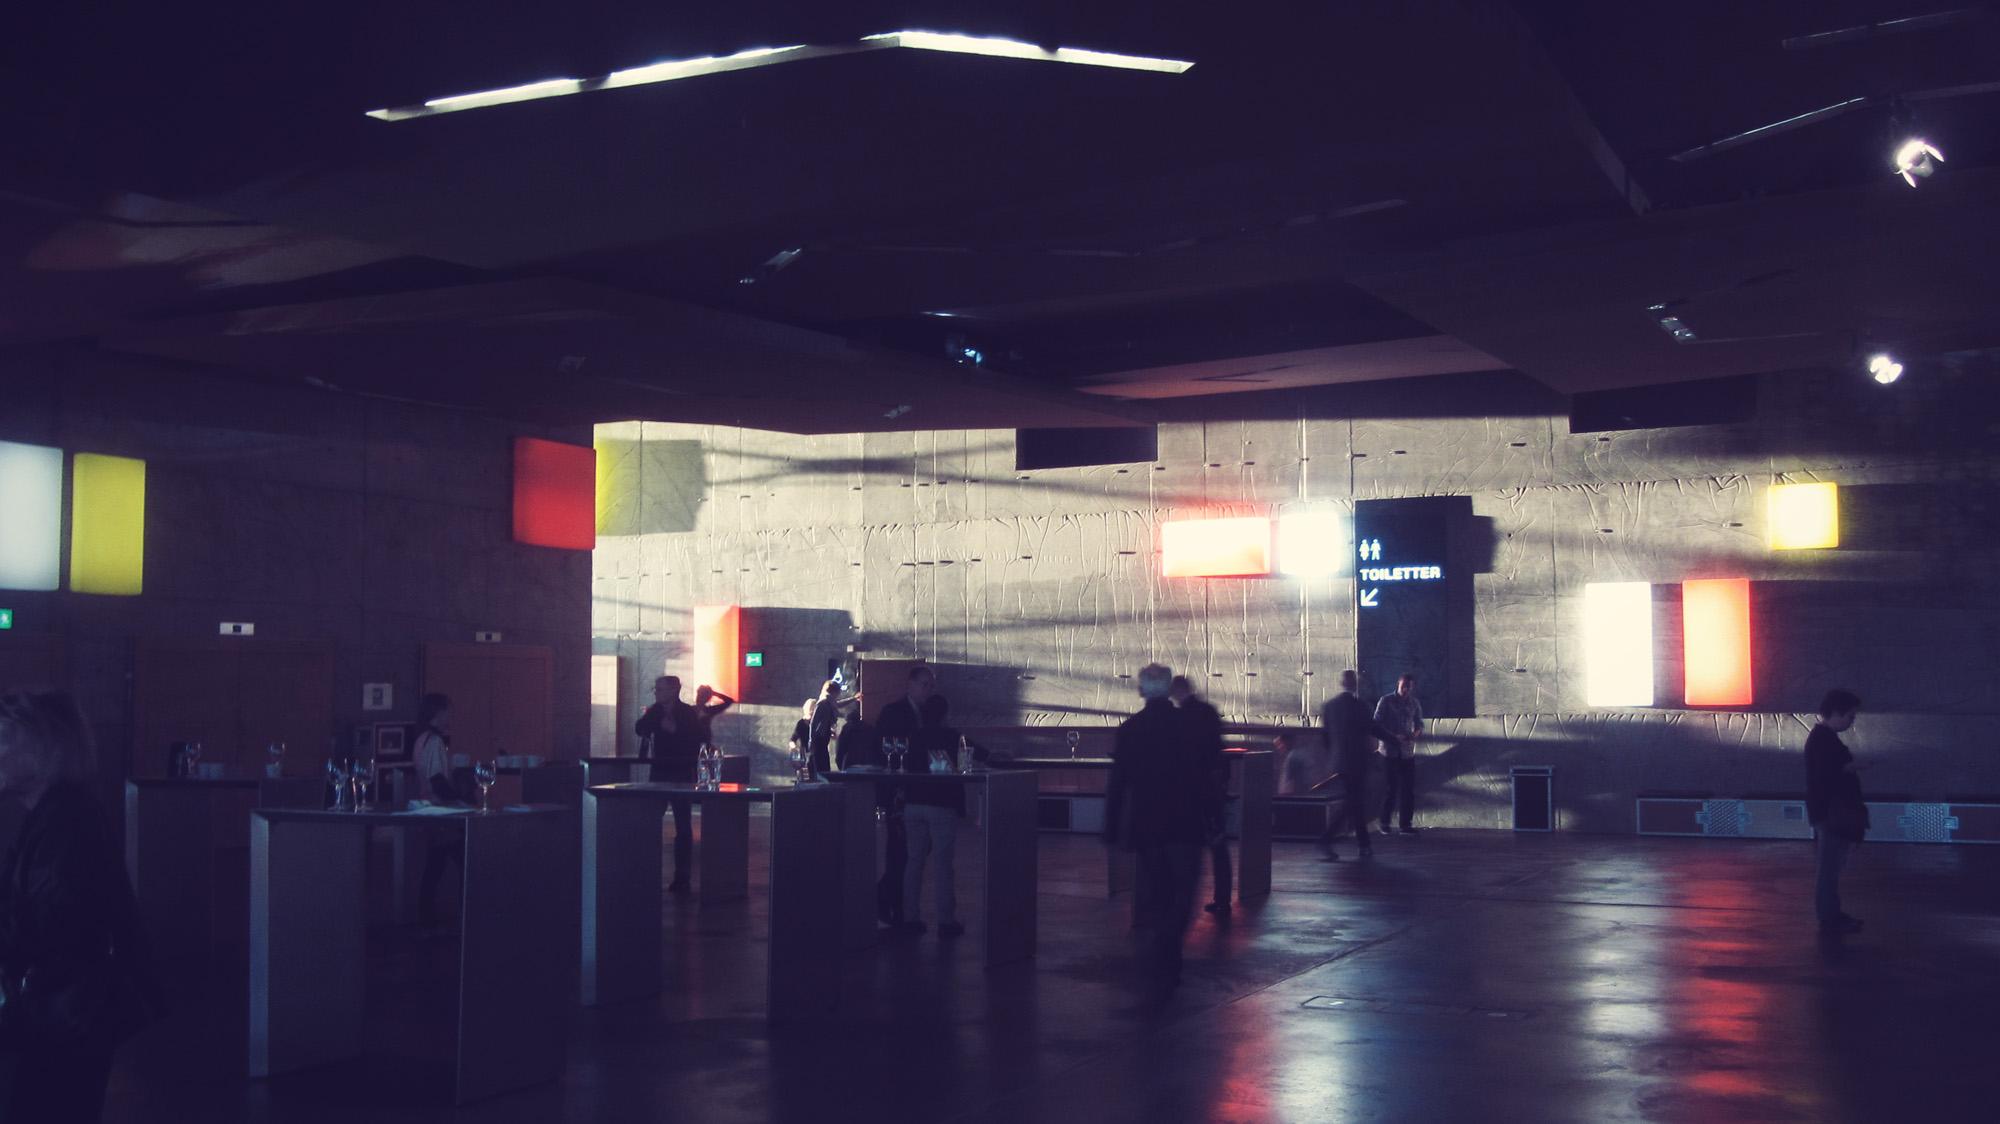 CPH_Koncerthuset Interior_04.jpg